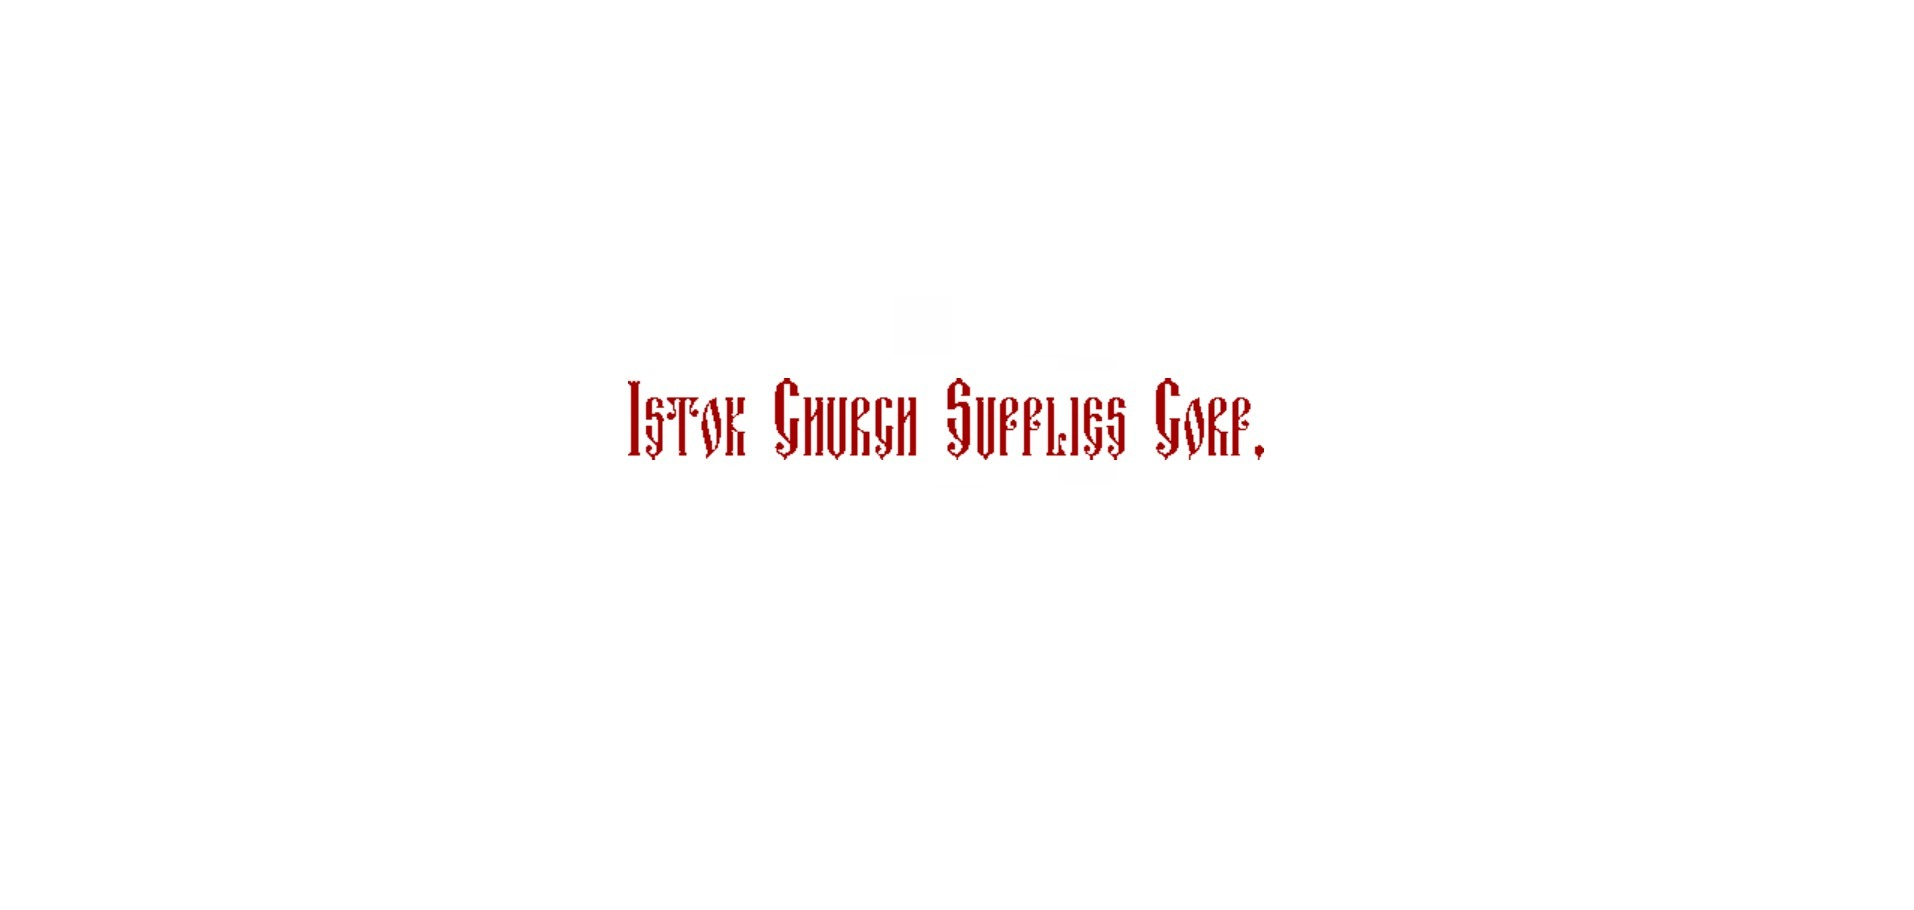 ISTOK Church Supplies  (@istokchurchsupplies) Cover Image